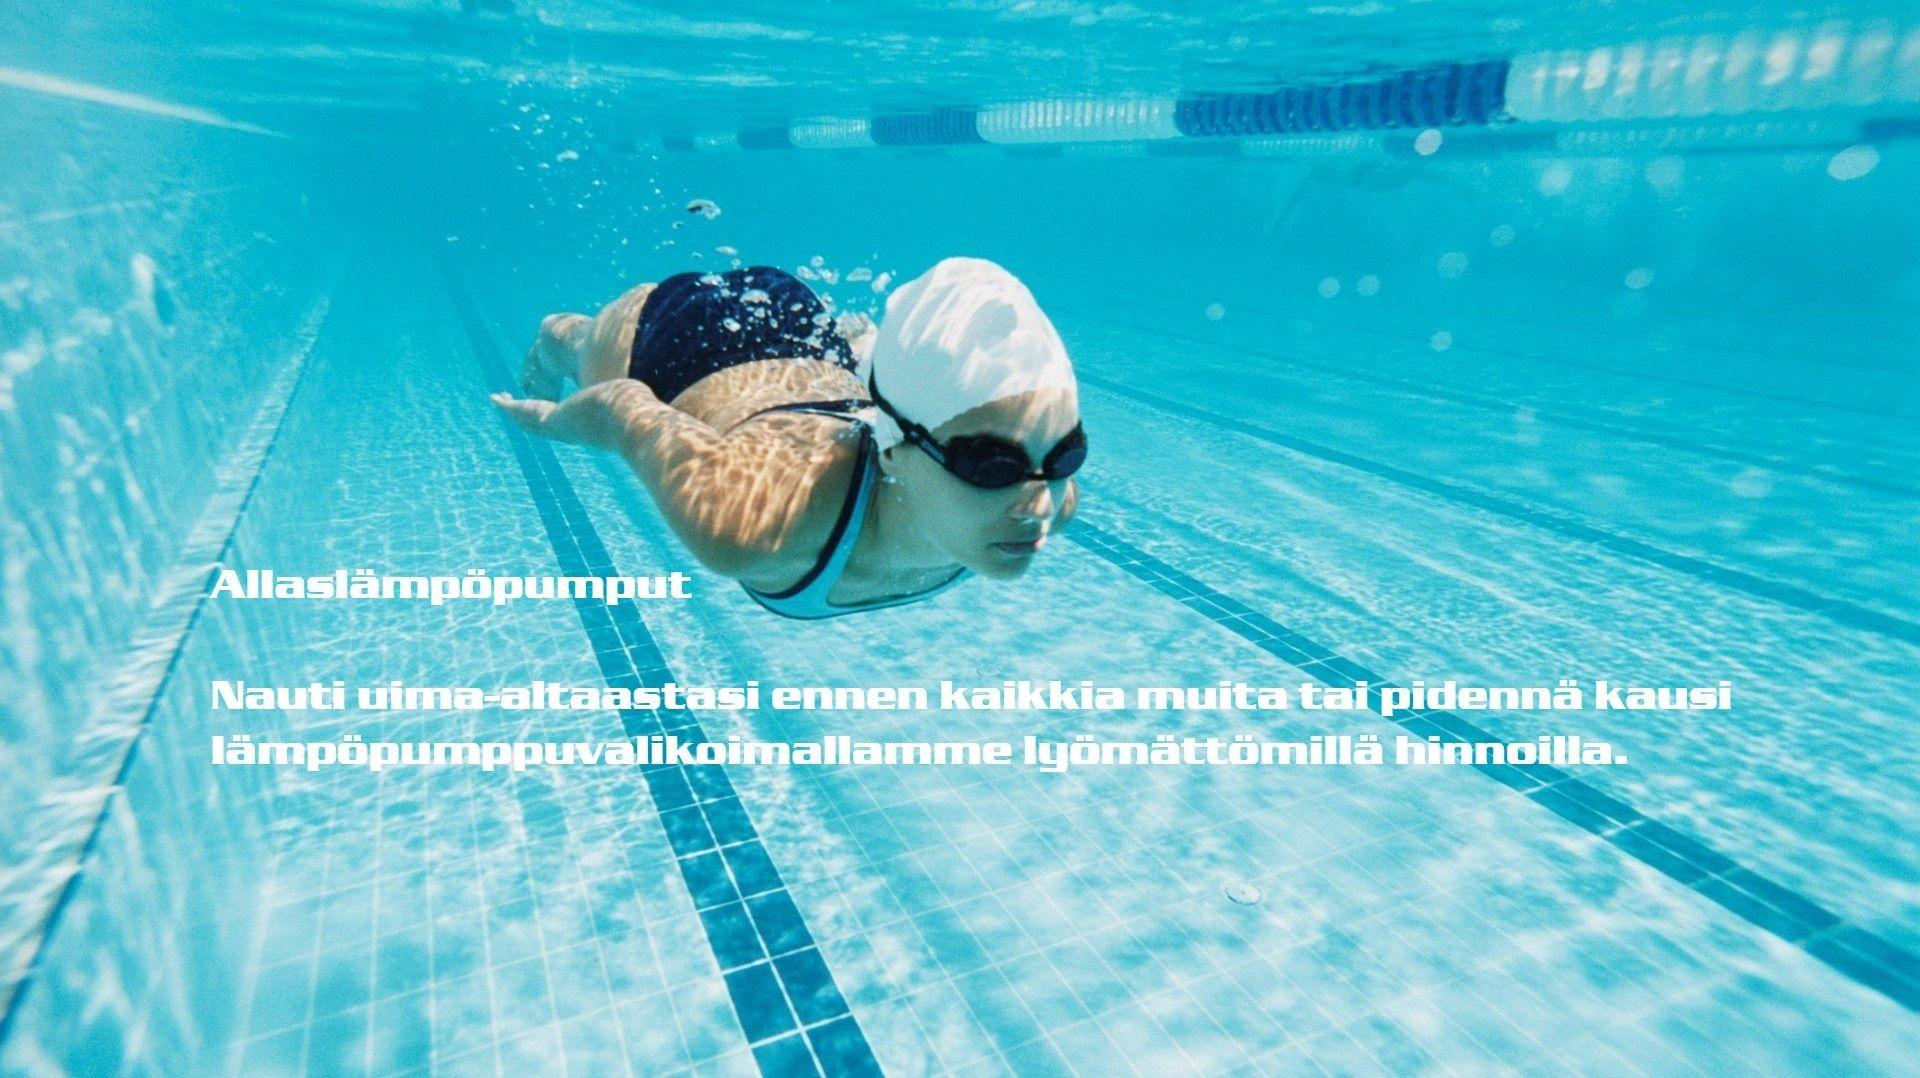 Uima-allas lämpöpumppu